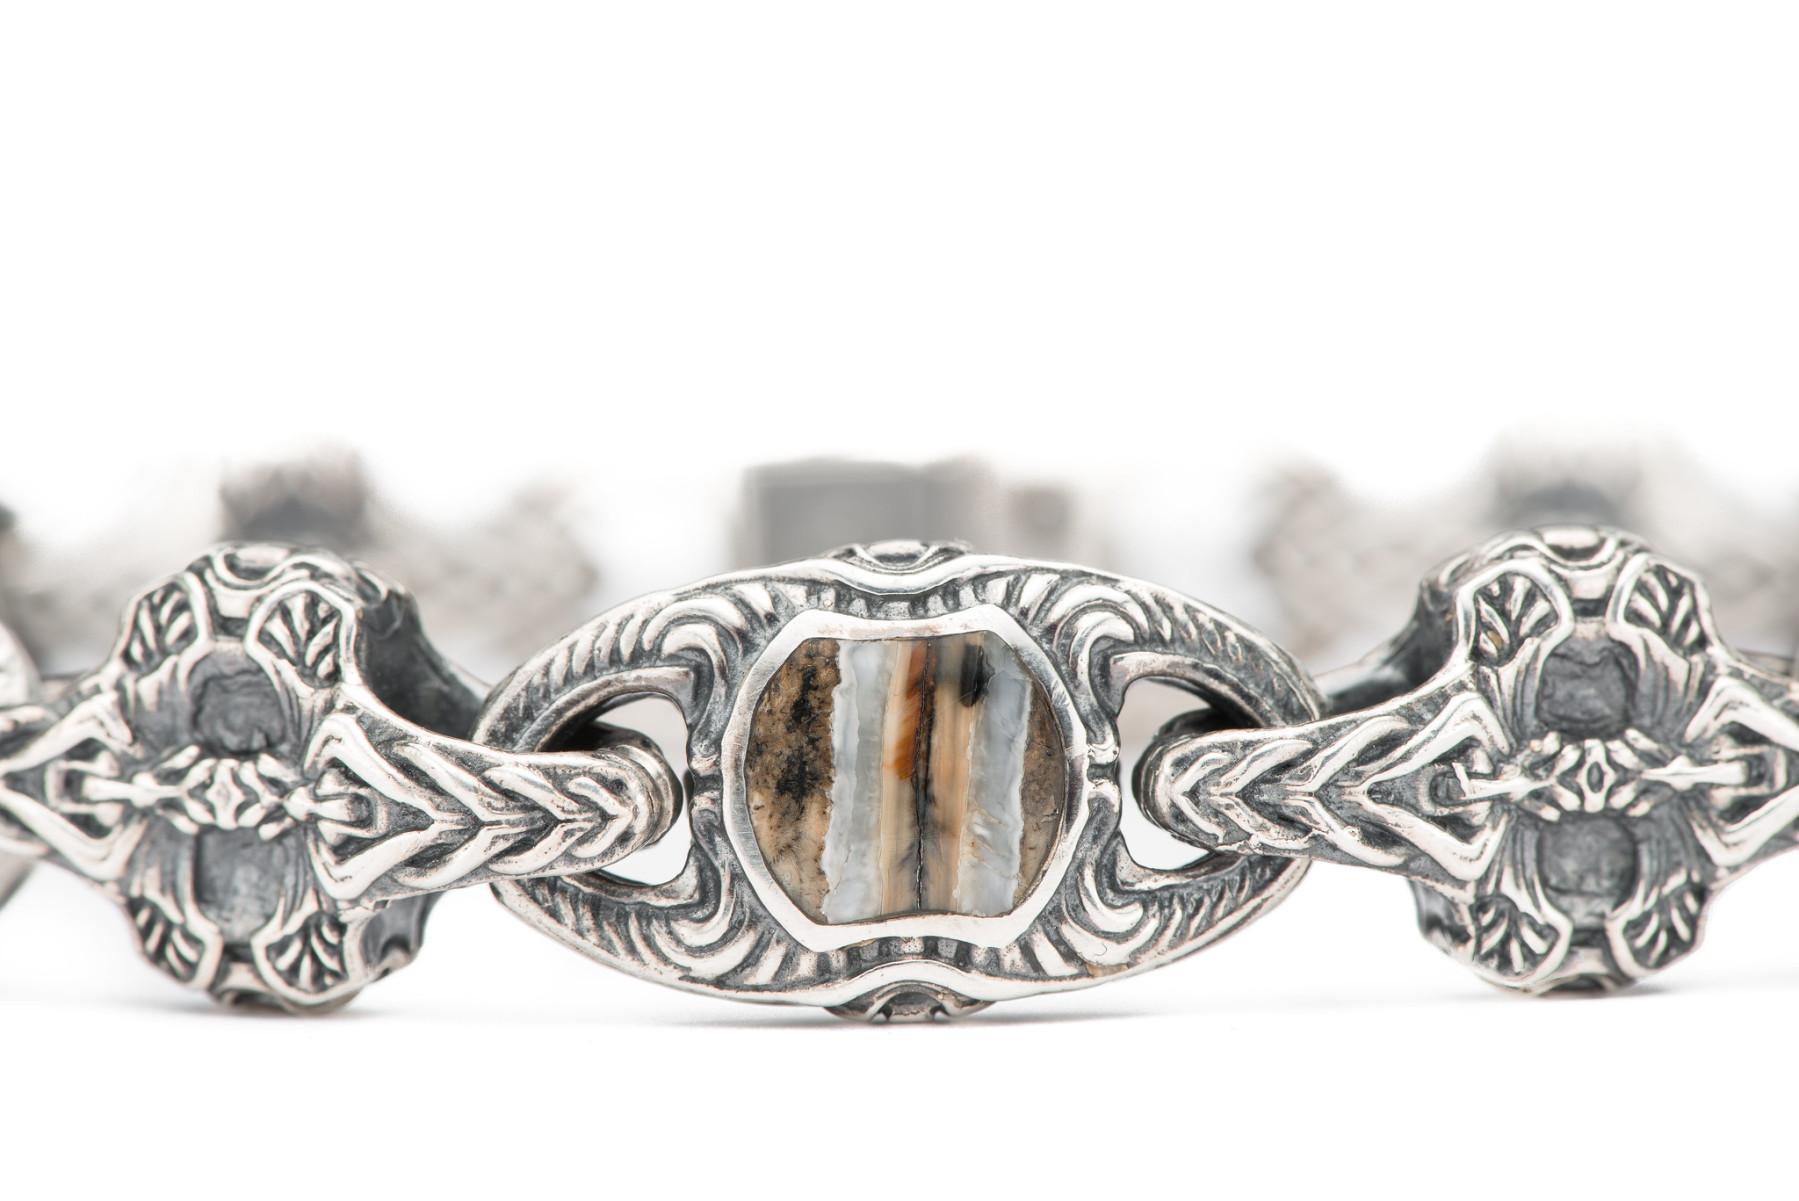 William Henry Squire Bracelet Detail